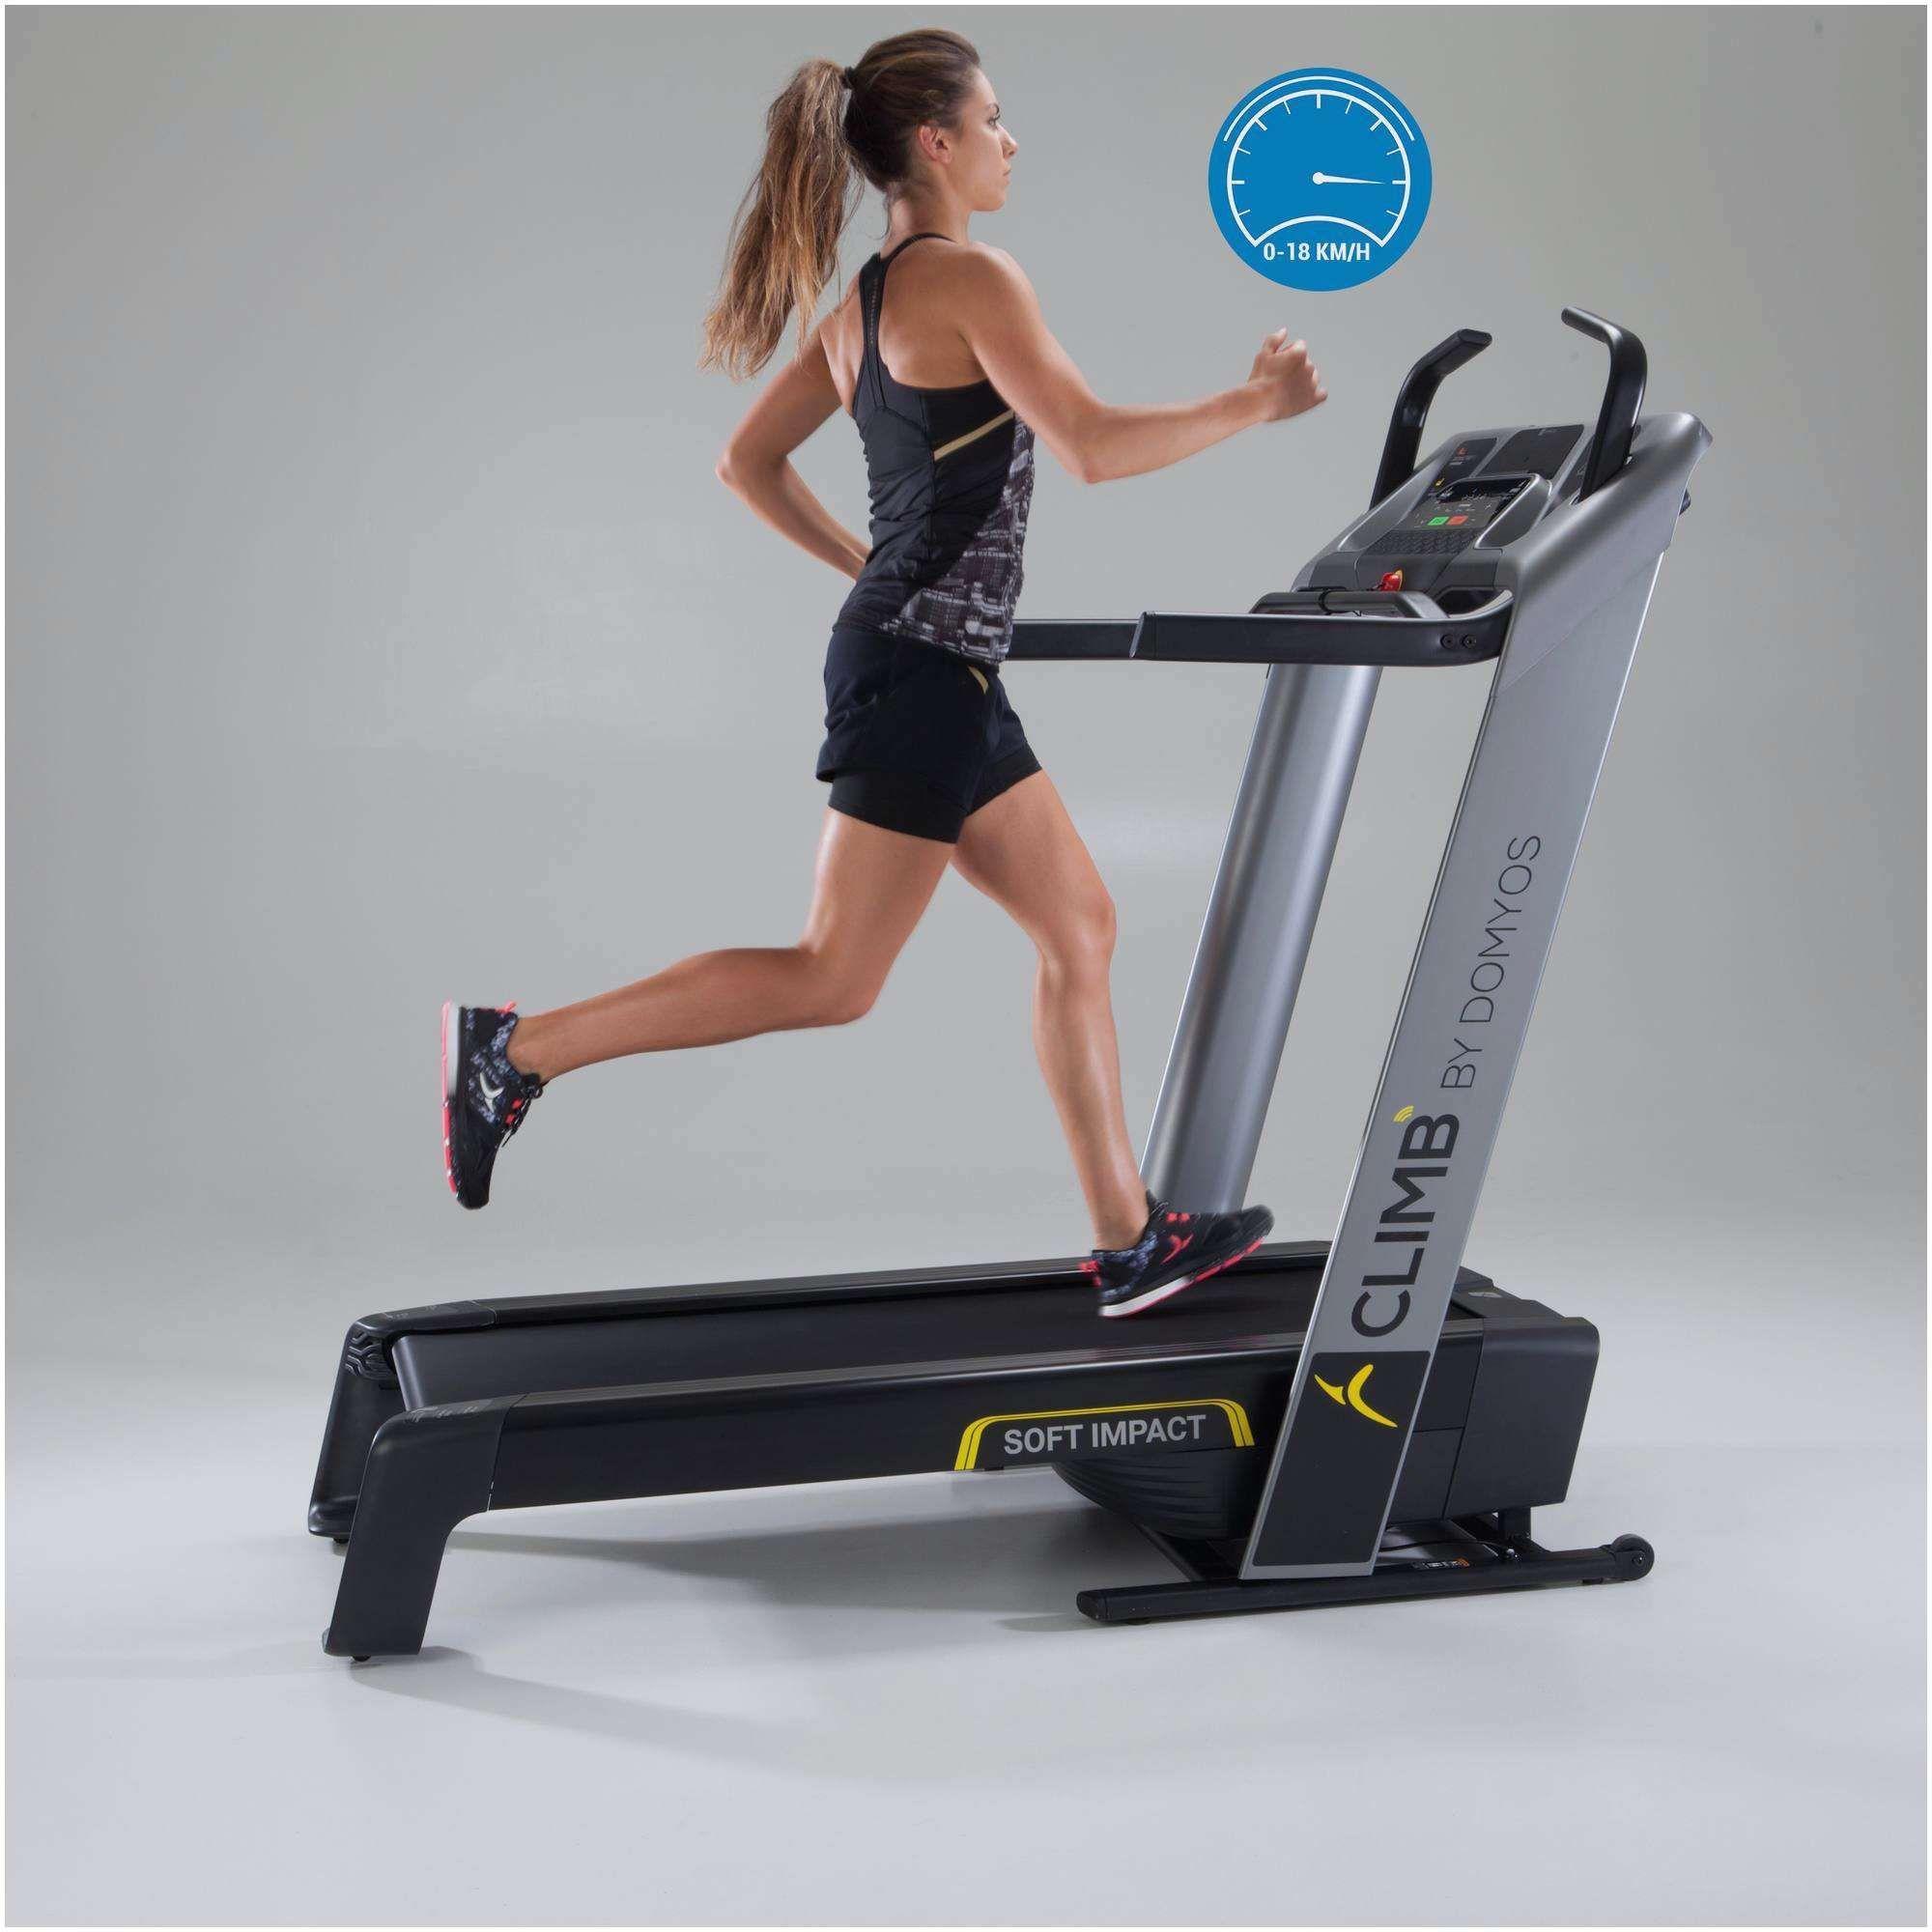 Banc De Musculation Domyos Hg 60 Banc De Musculation Domyos Hg 60 Fukuoka Fukuoka Japan Fukuoka Banc De Musculation Occasion Down Treadmill Gym Equipment Gym